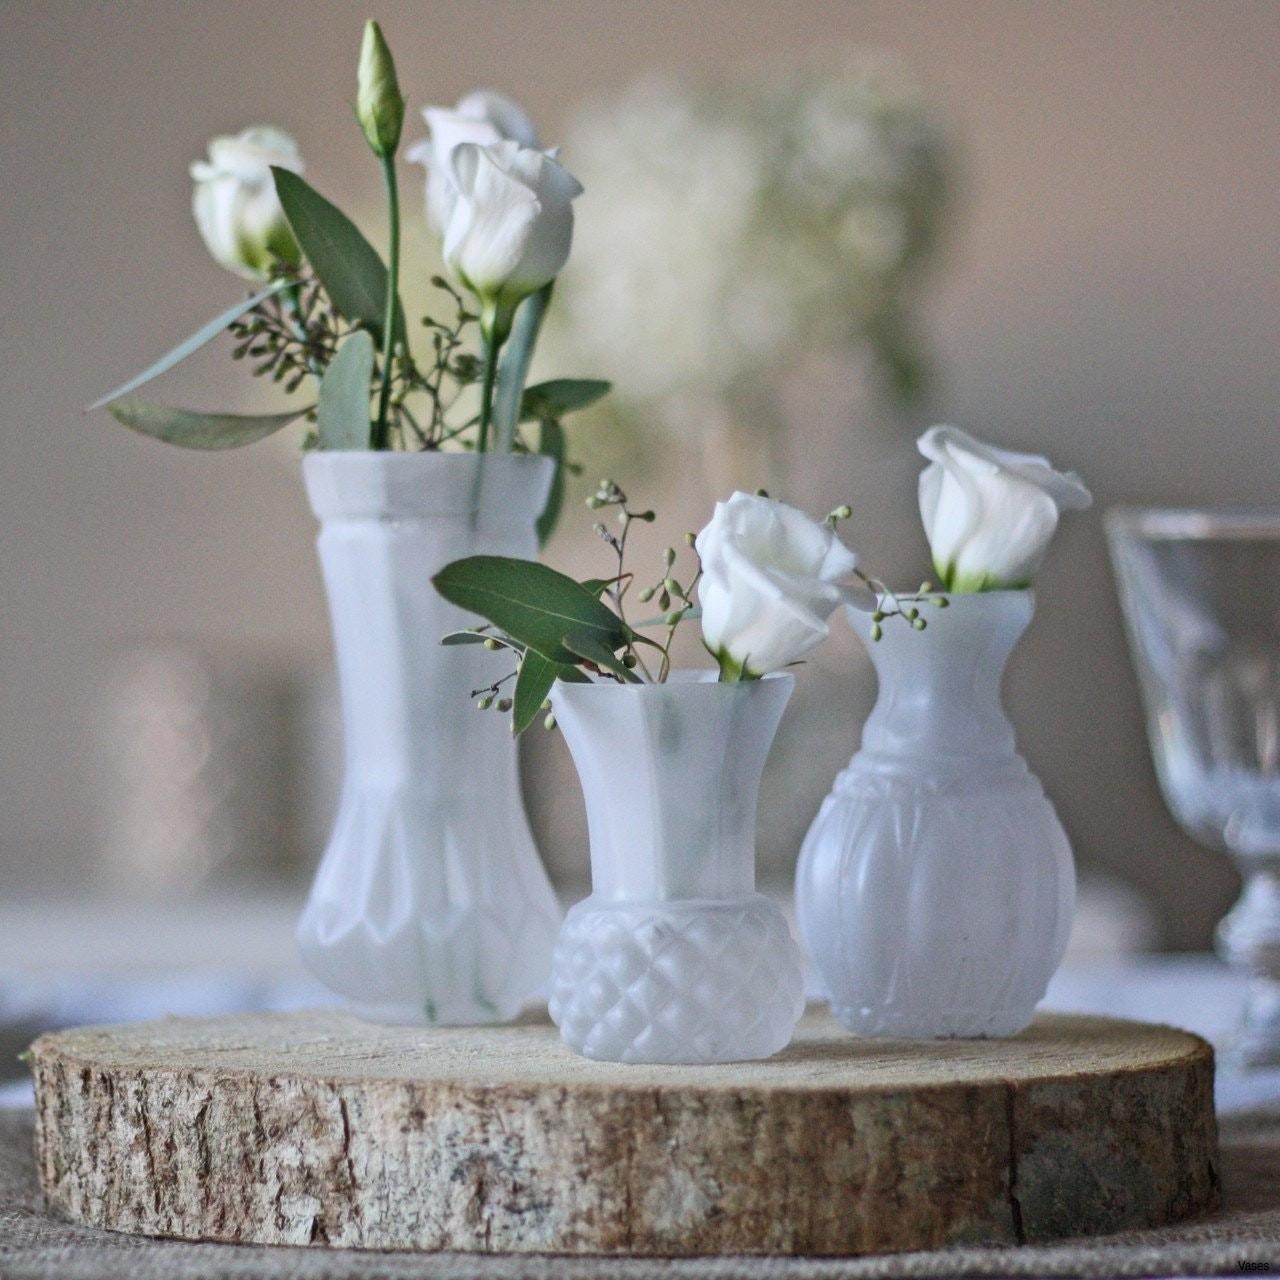 cheap cylinder vase centerpieces of wedding decoration supplies best of jar flower 1h vases bud wedding regarding wedding decoration supplies best of jar flower 1h vases bud wedding vase centerpiece idea i 0d white